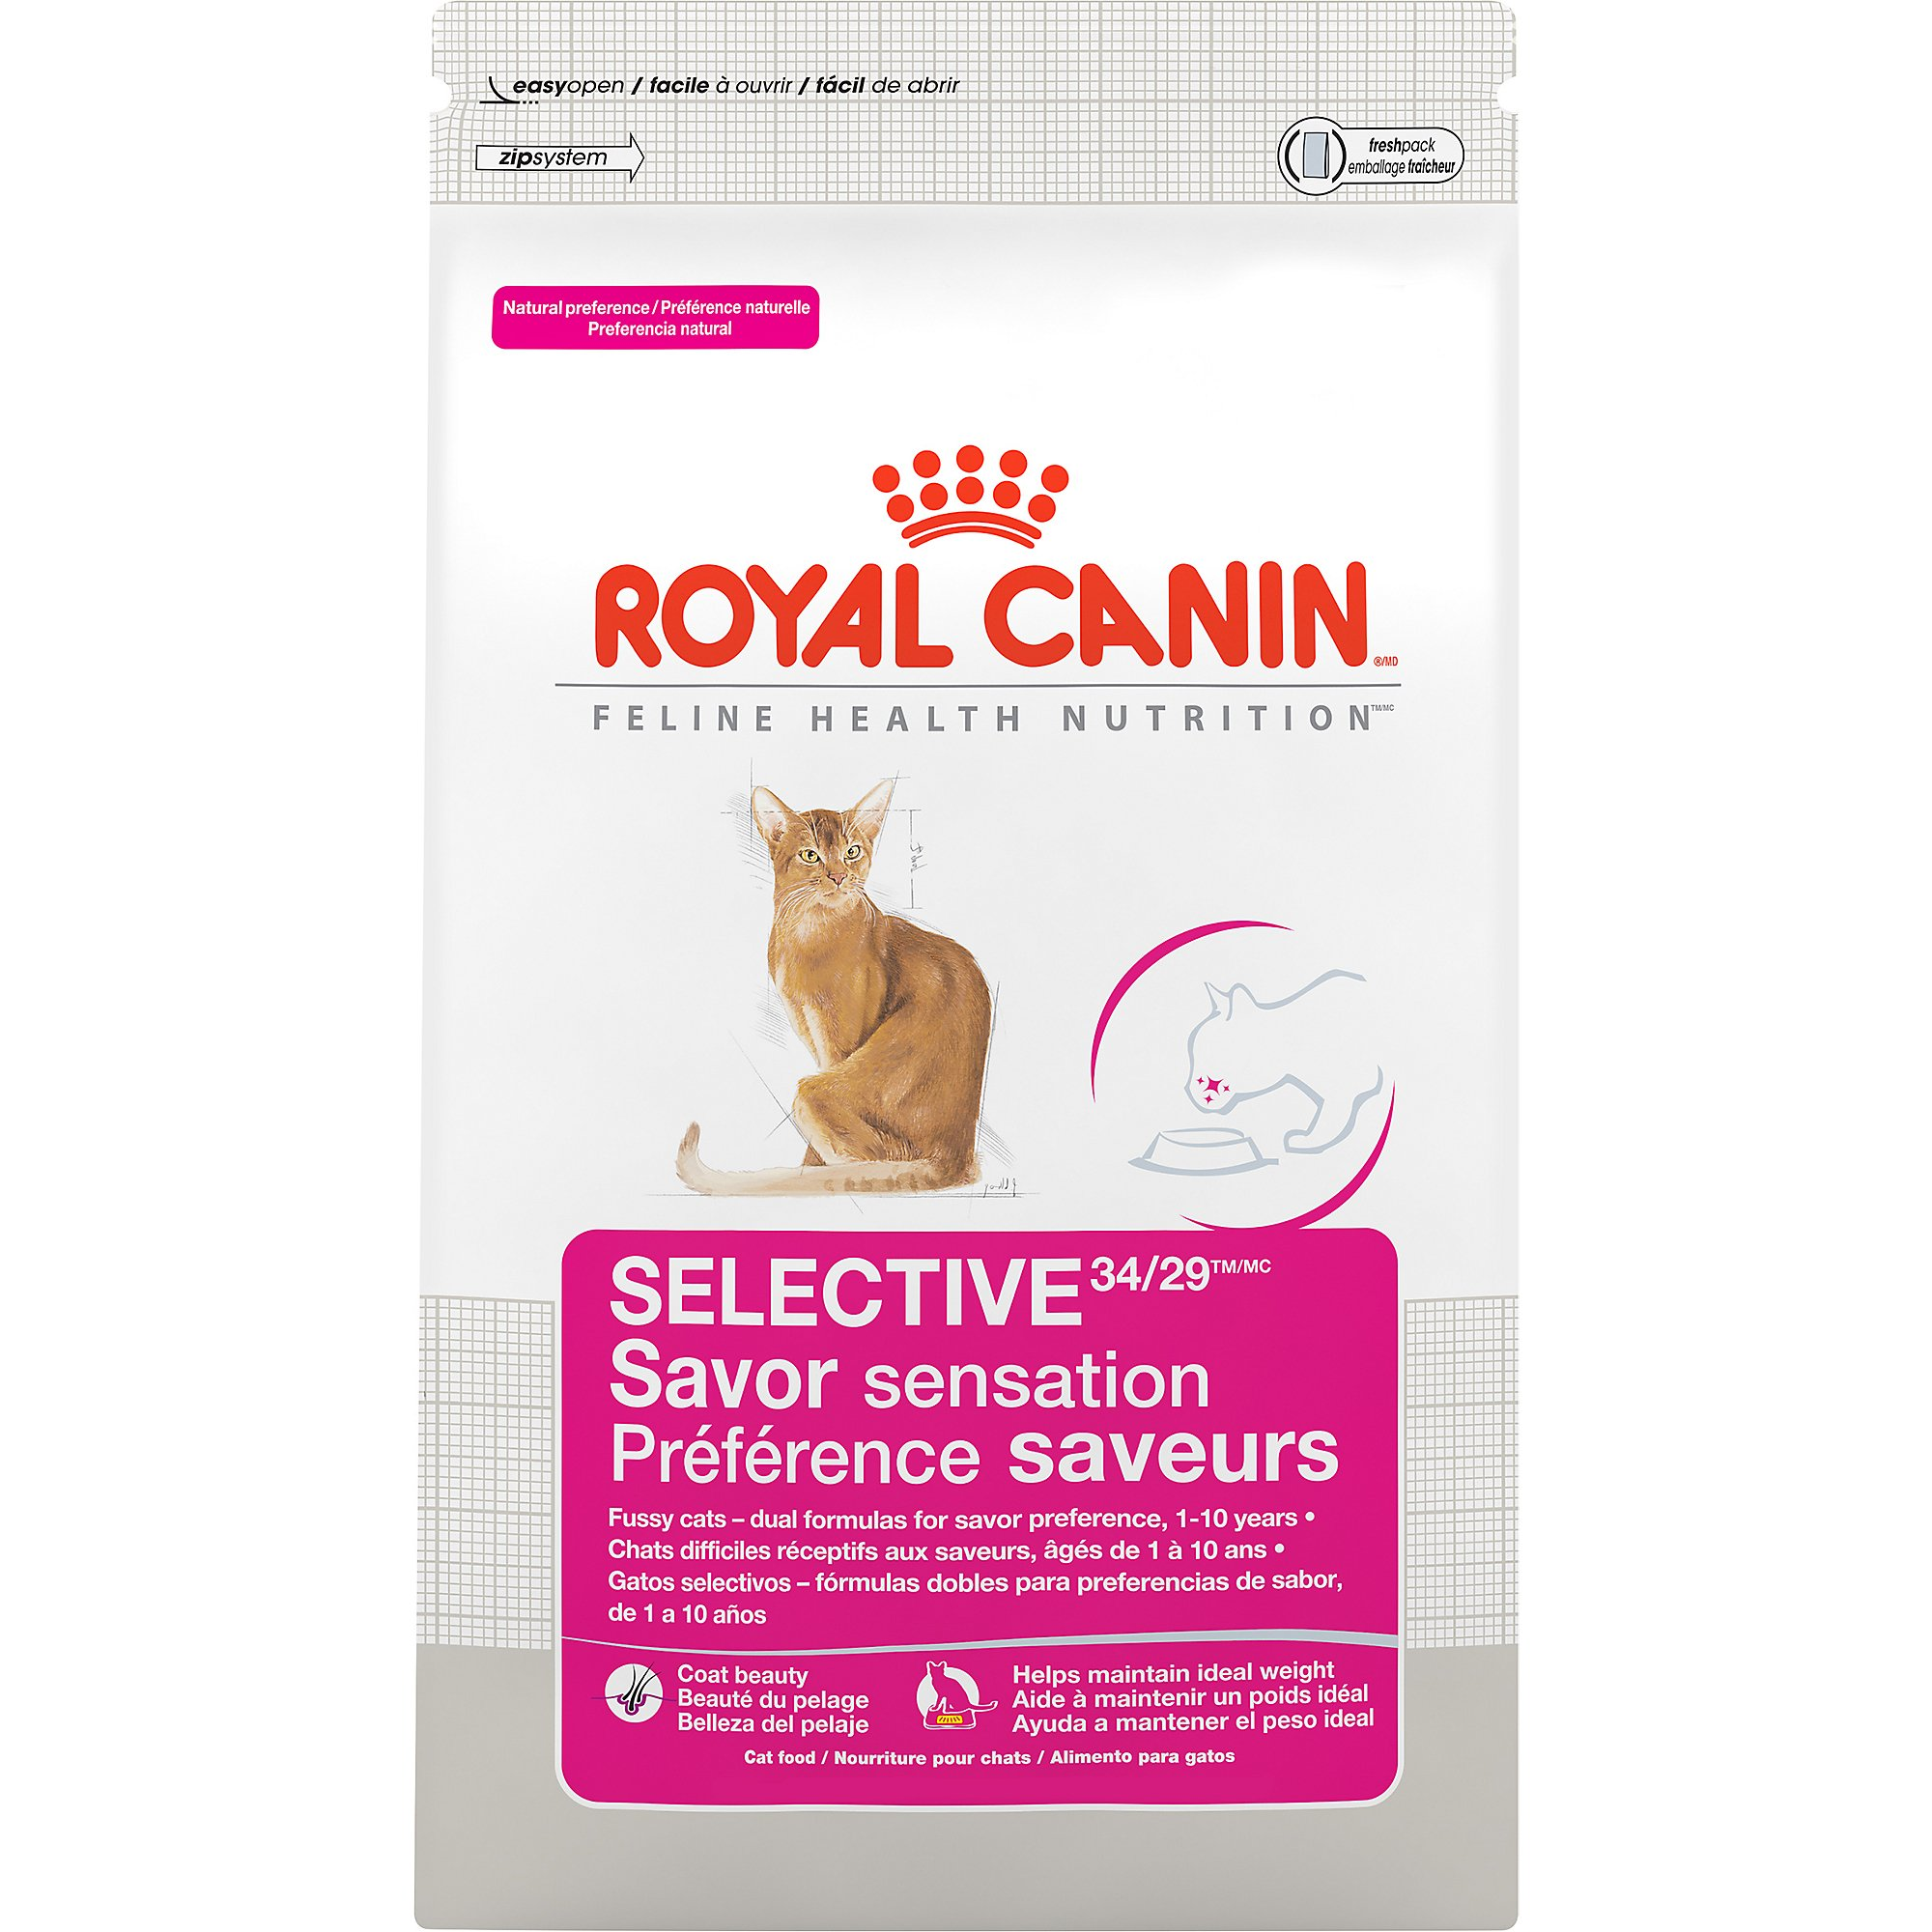 Royal Canin Feline Health Nutrition Selective 34/29 Savor Sensation Adult Dry Cat Food